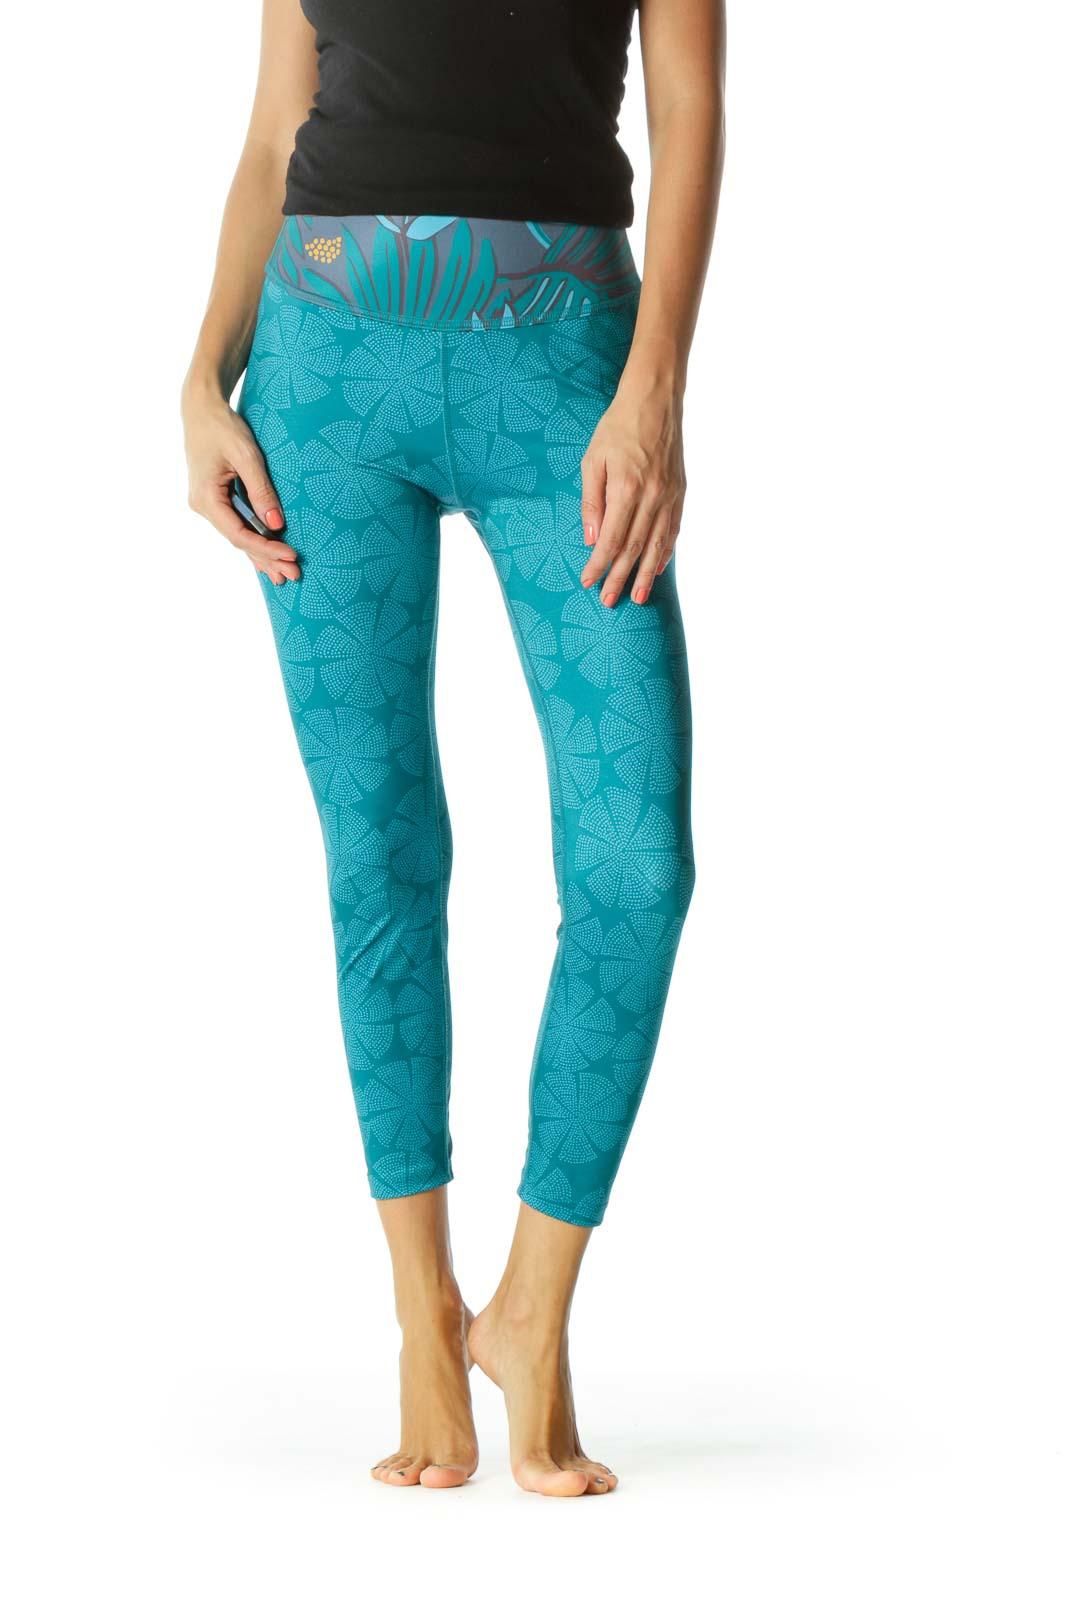 Blue Gray Orange Print Active High-Rise Yoga Pants Front